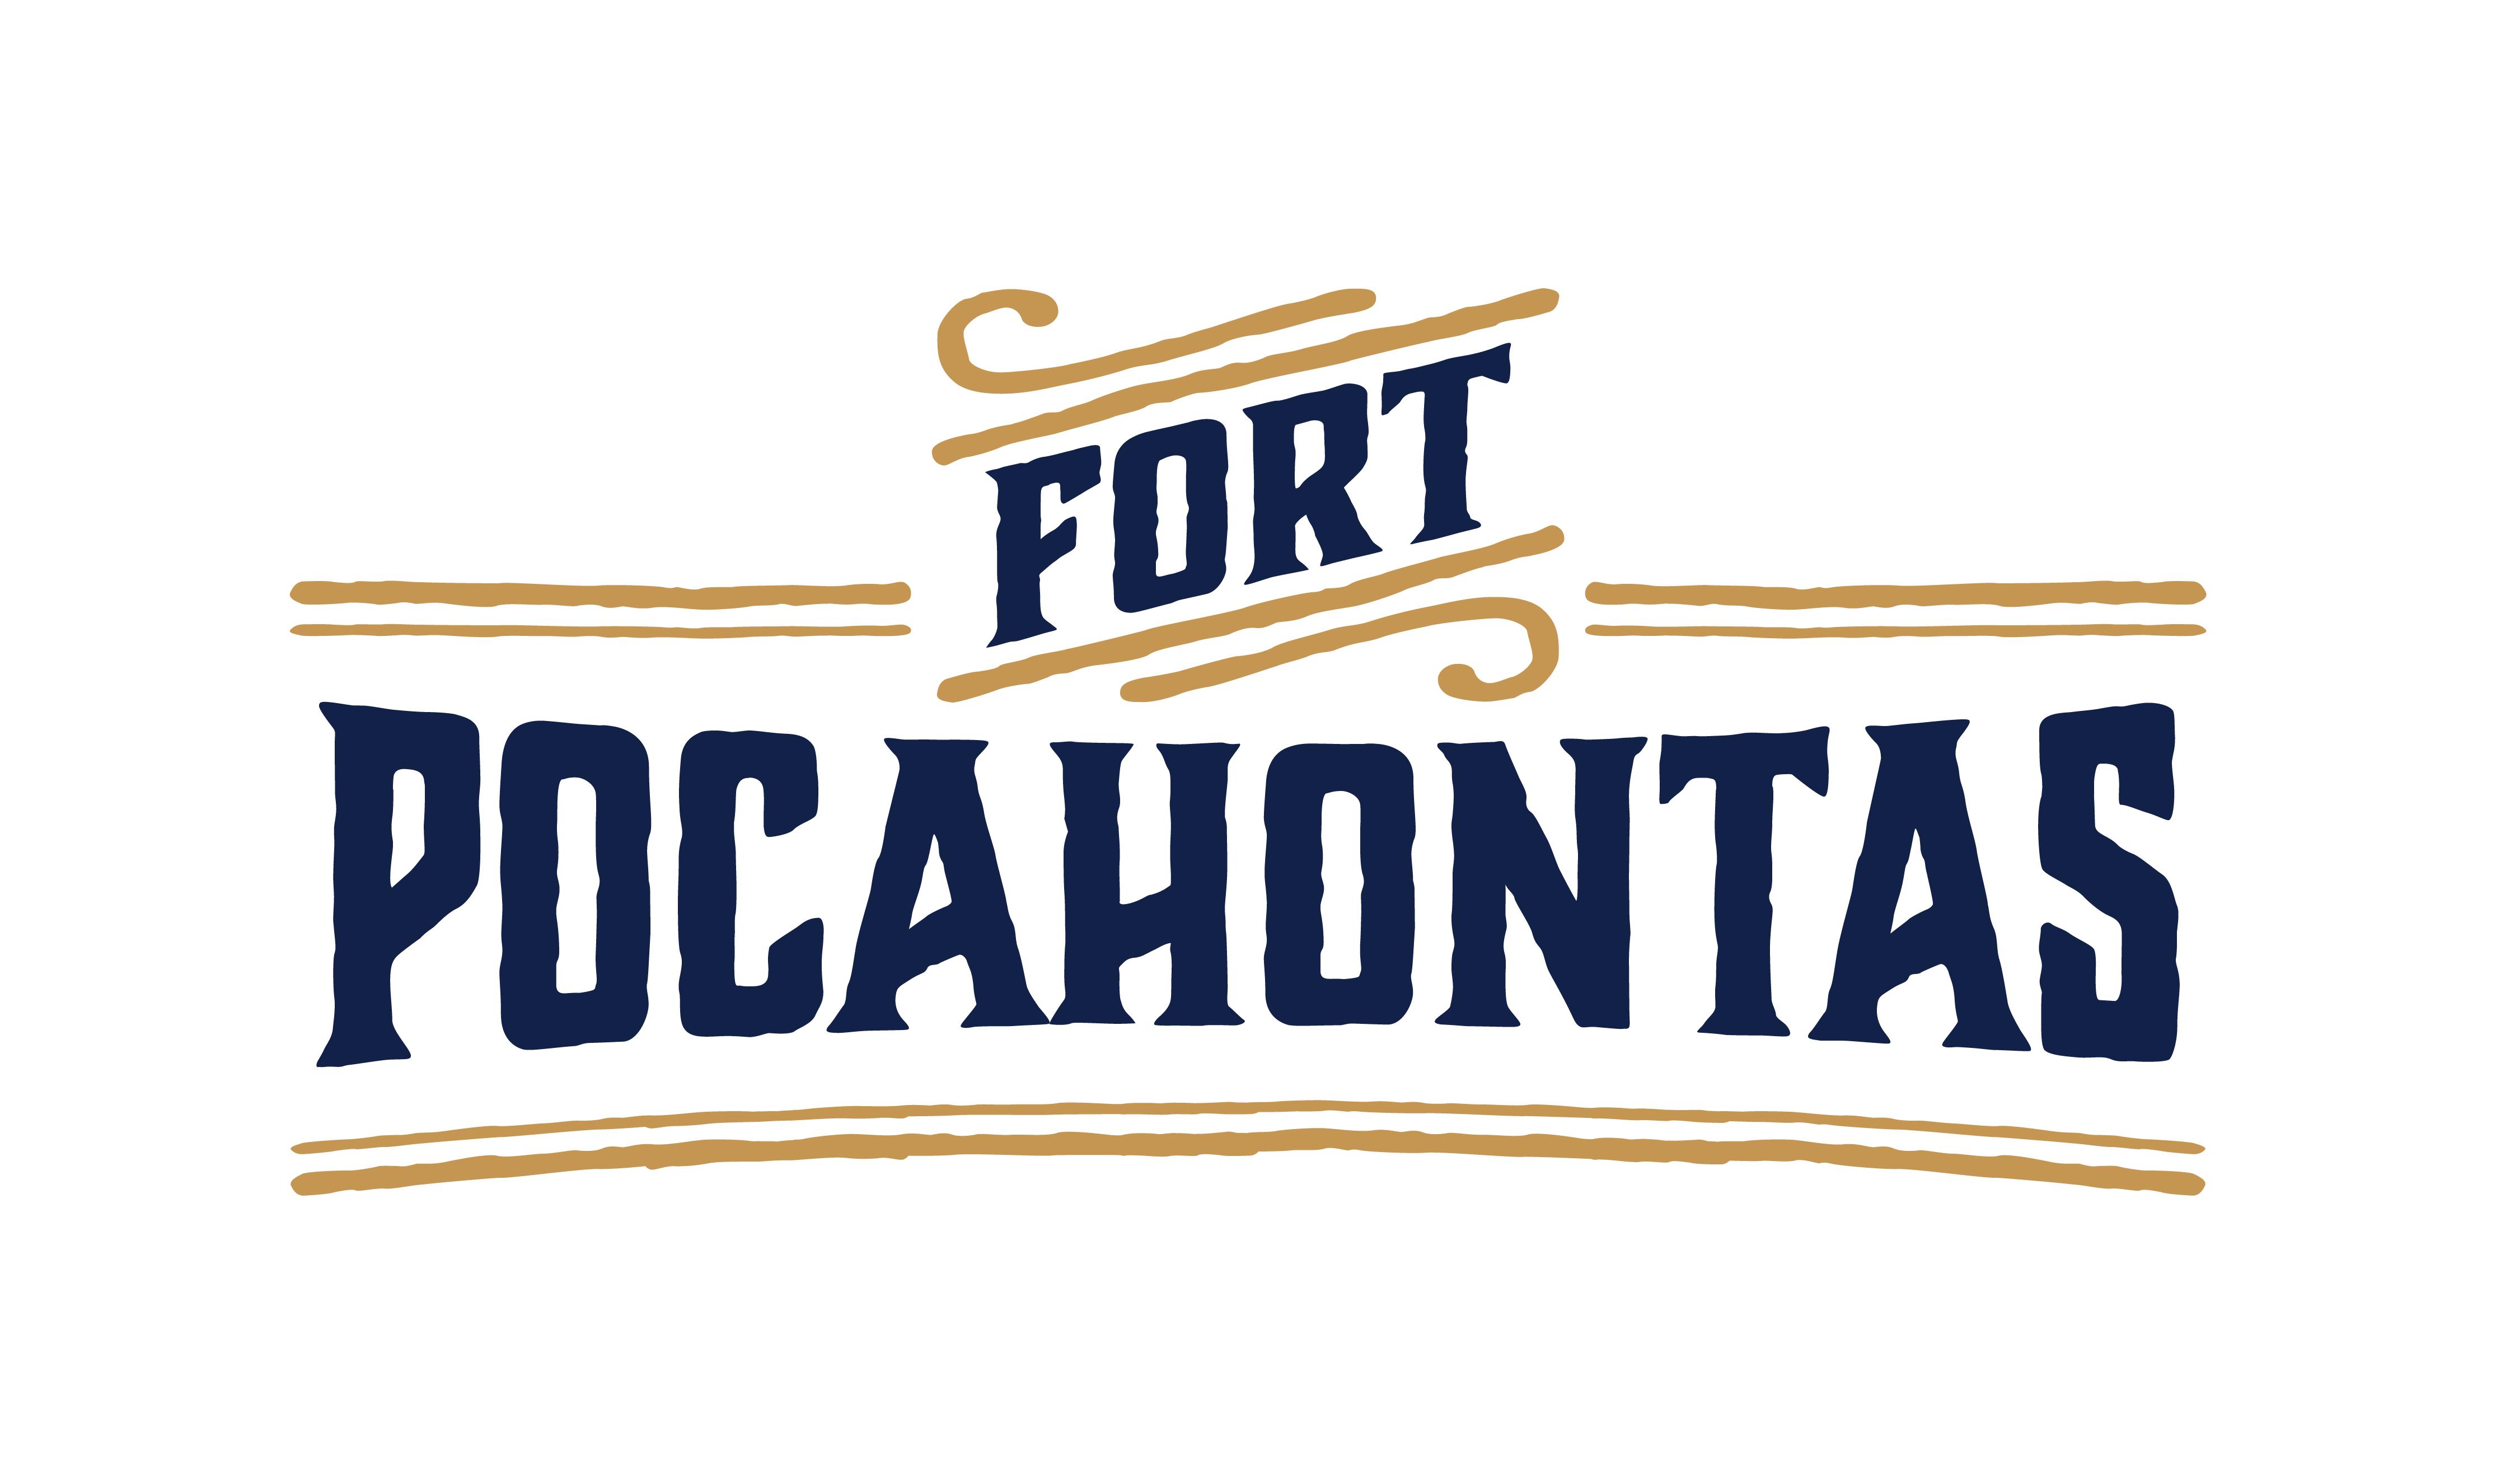 Fort Pocahontas